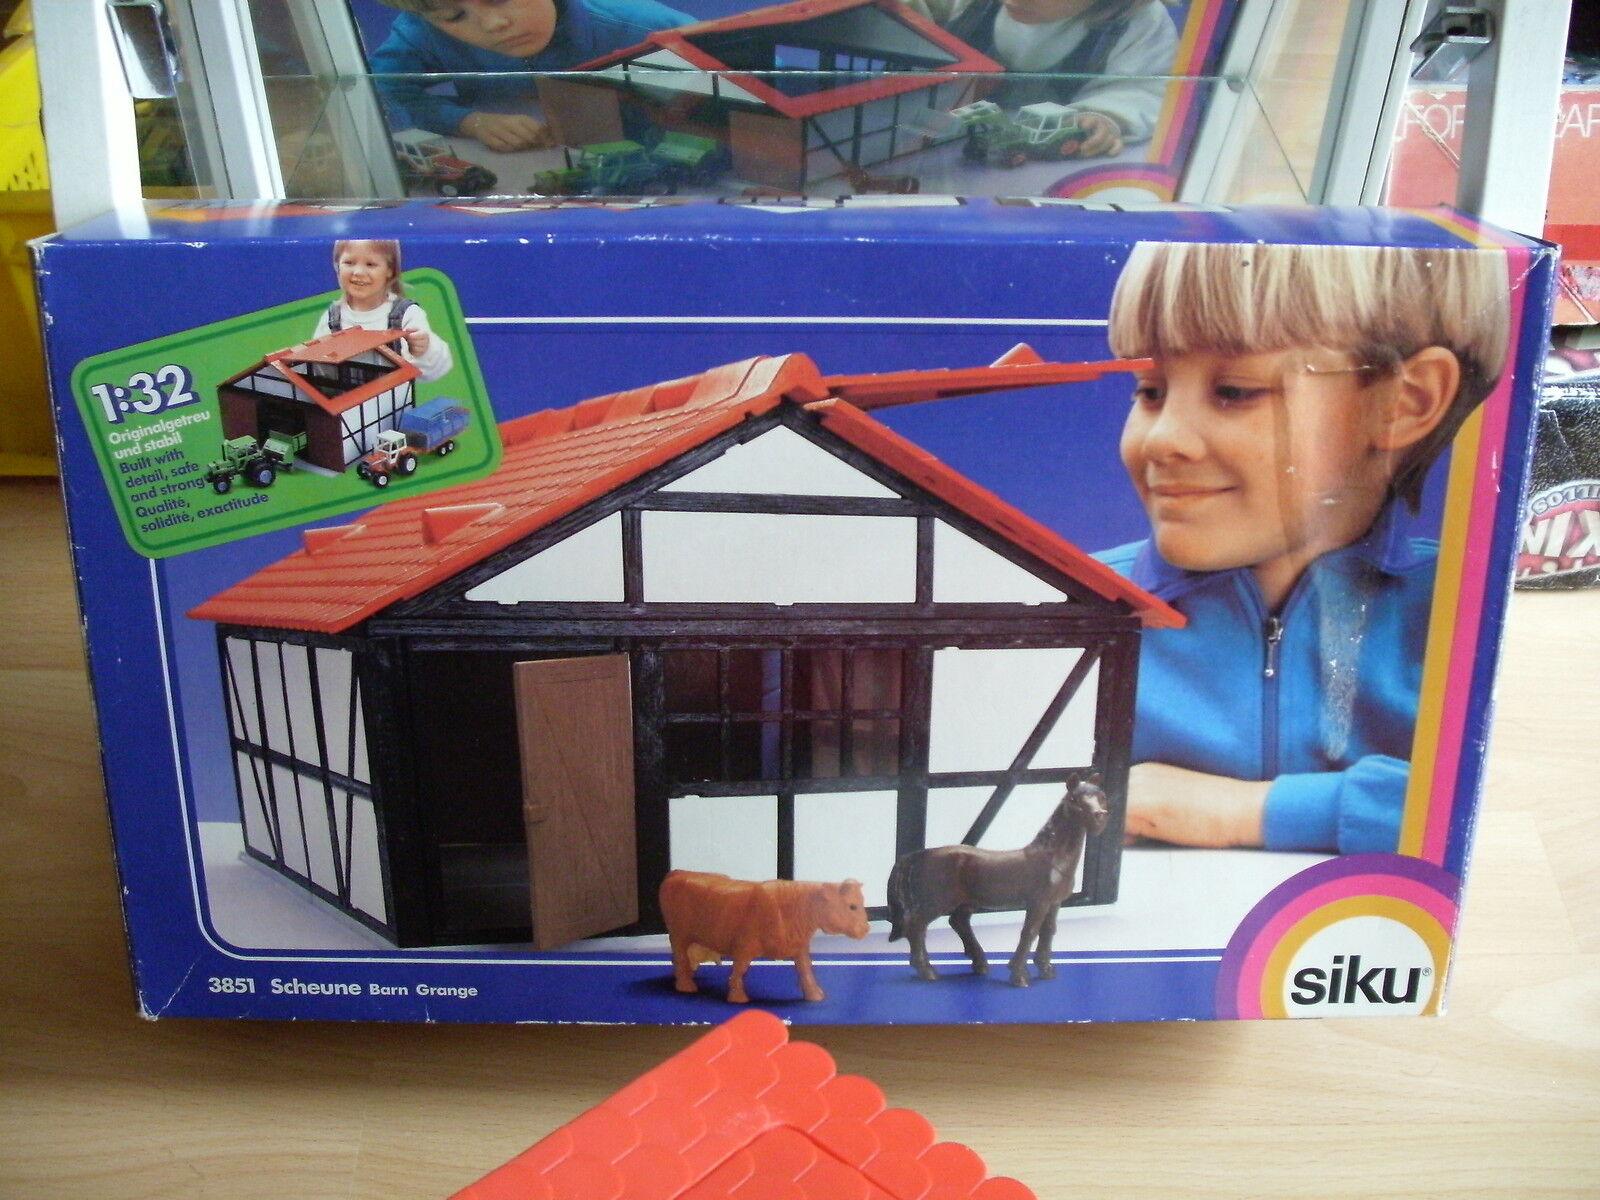 Siku Scheune   Barn   Garage in Box (siku nr  3851)